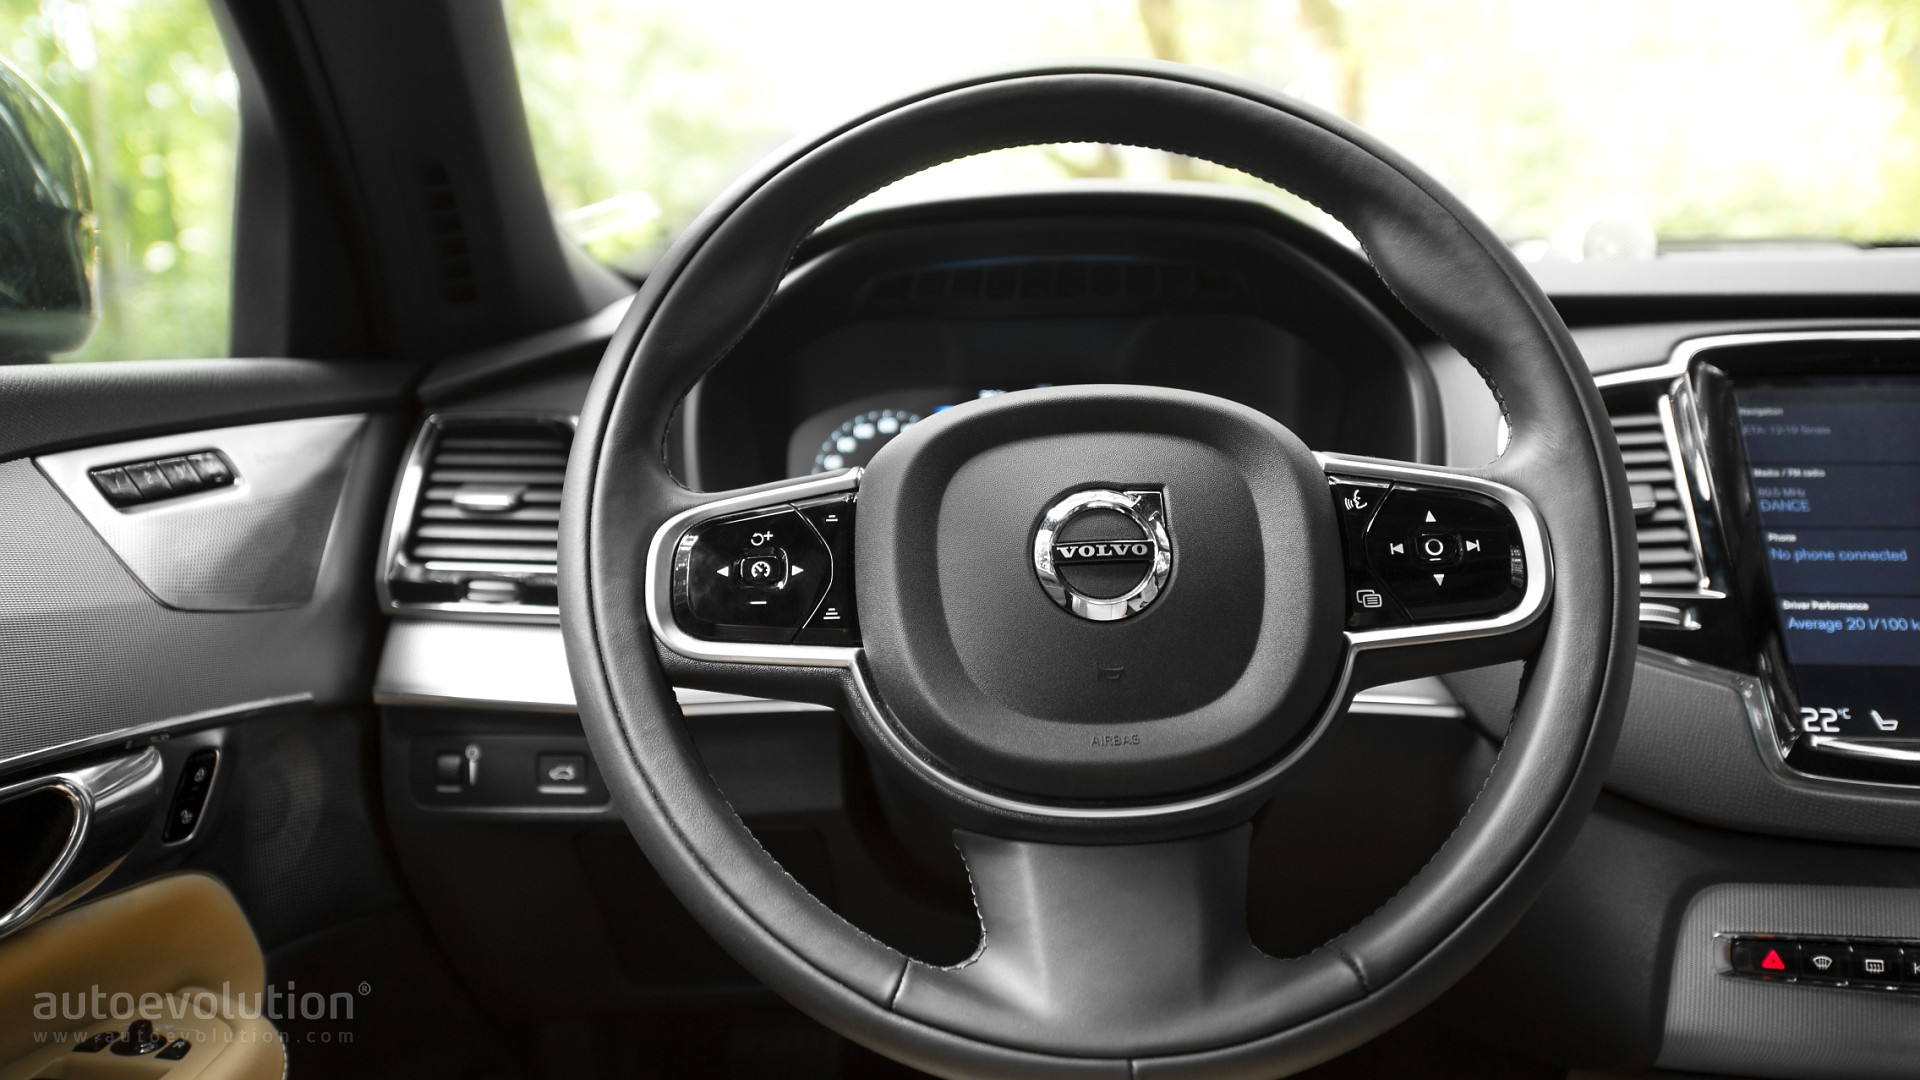 2016 VOLVO XC90 T6 Review - autoevolution